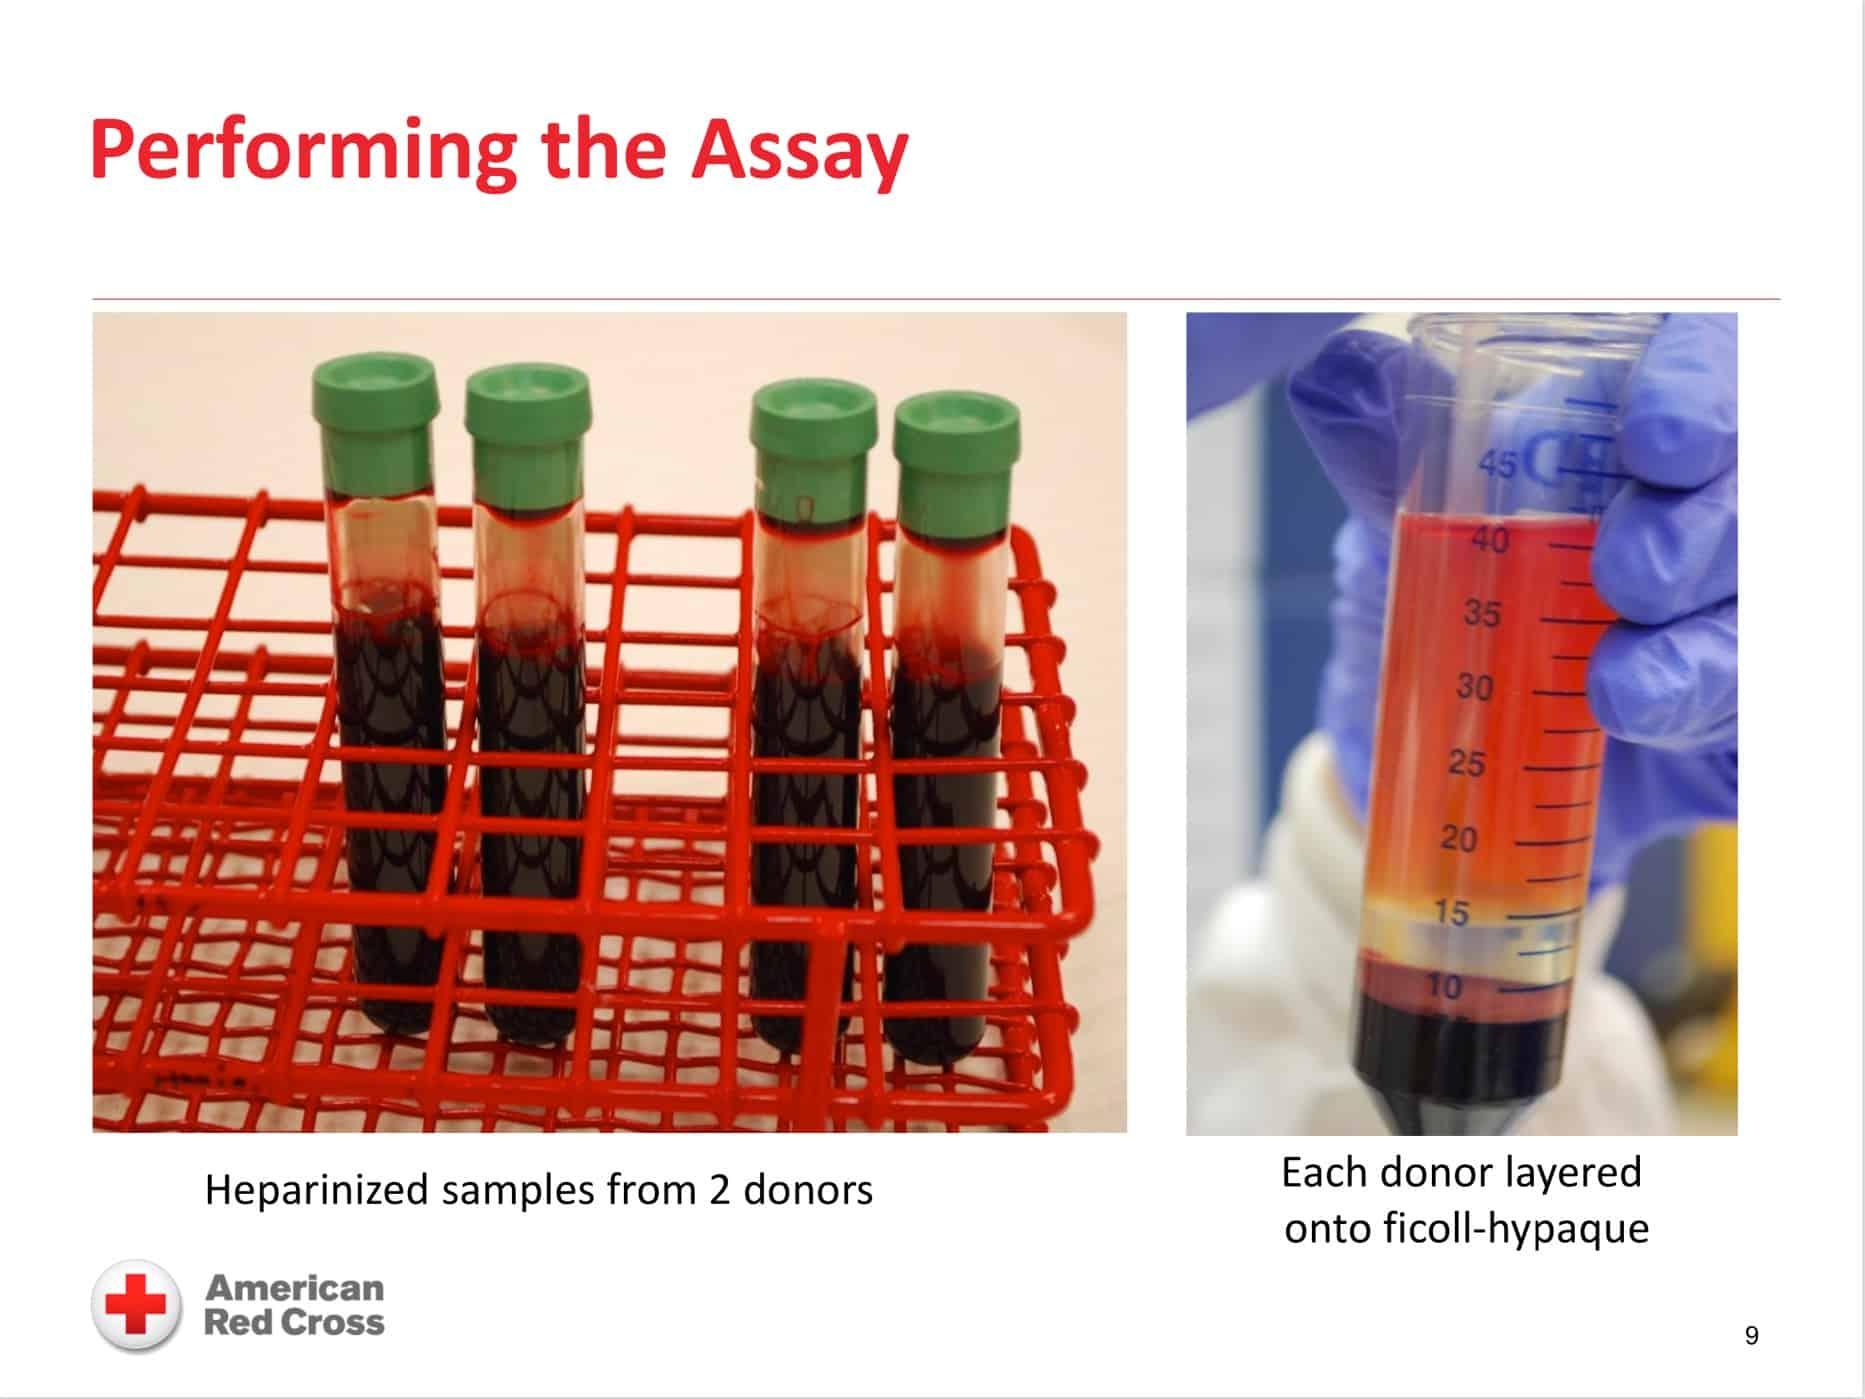 Monocyte monolayer assay image 1